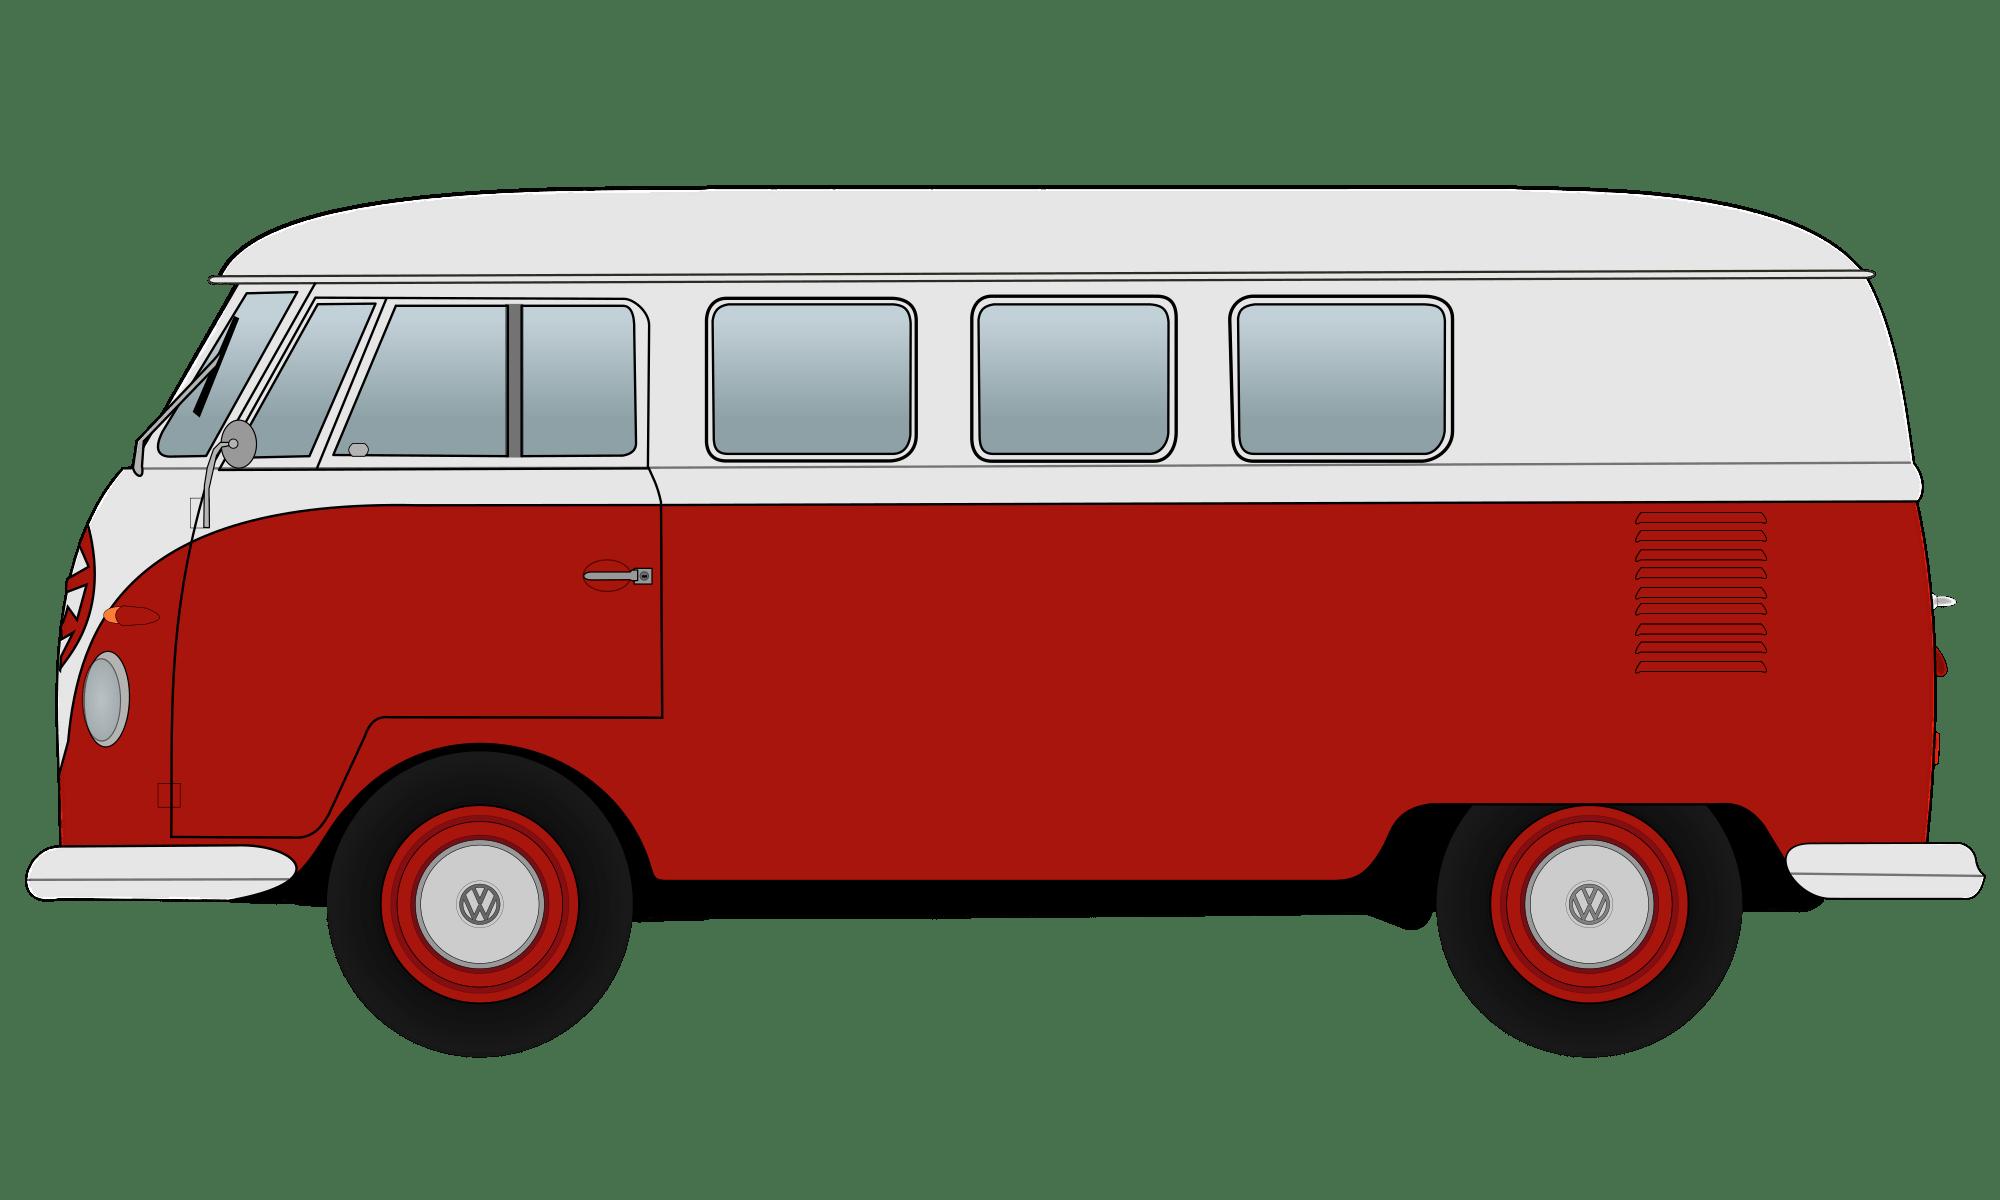 Vw camper clipart graphic free download Red Volkswagen Camper Van Clipart transparent PNG - StickPNG graphic free download